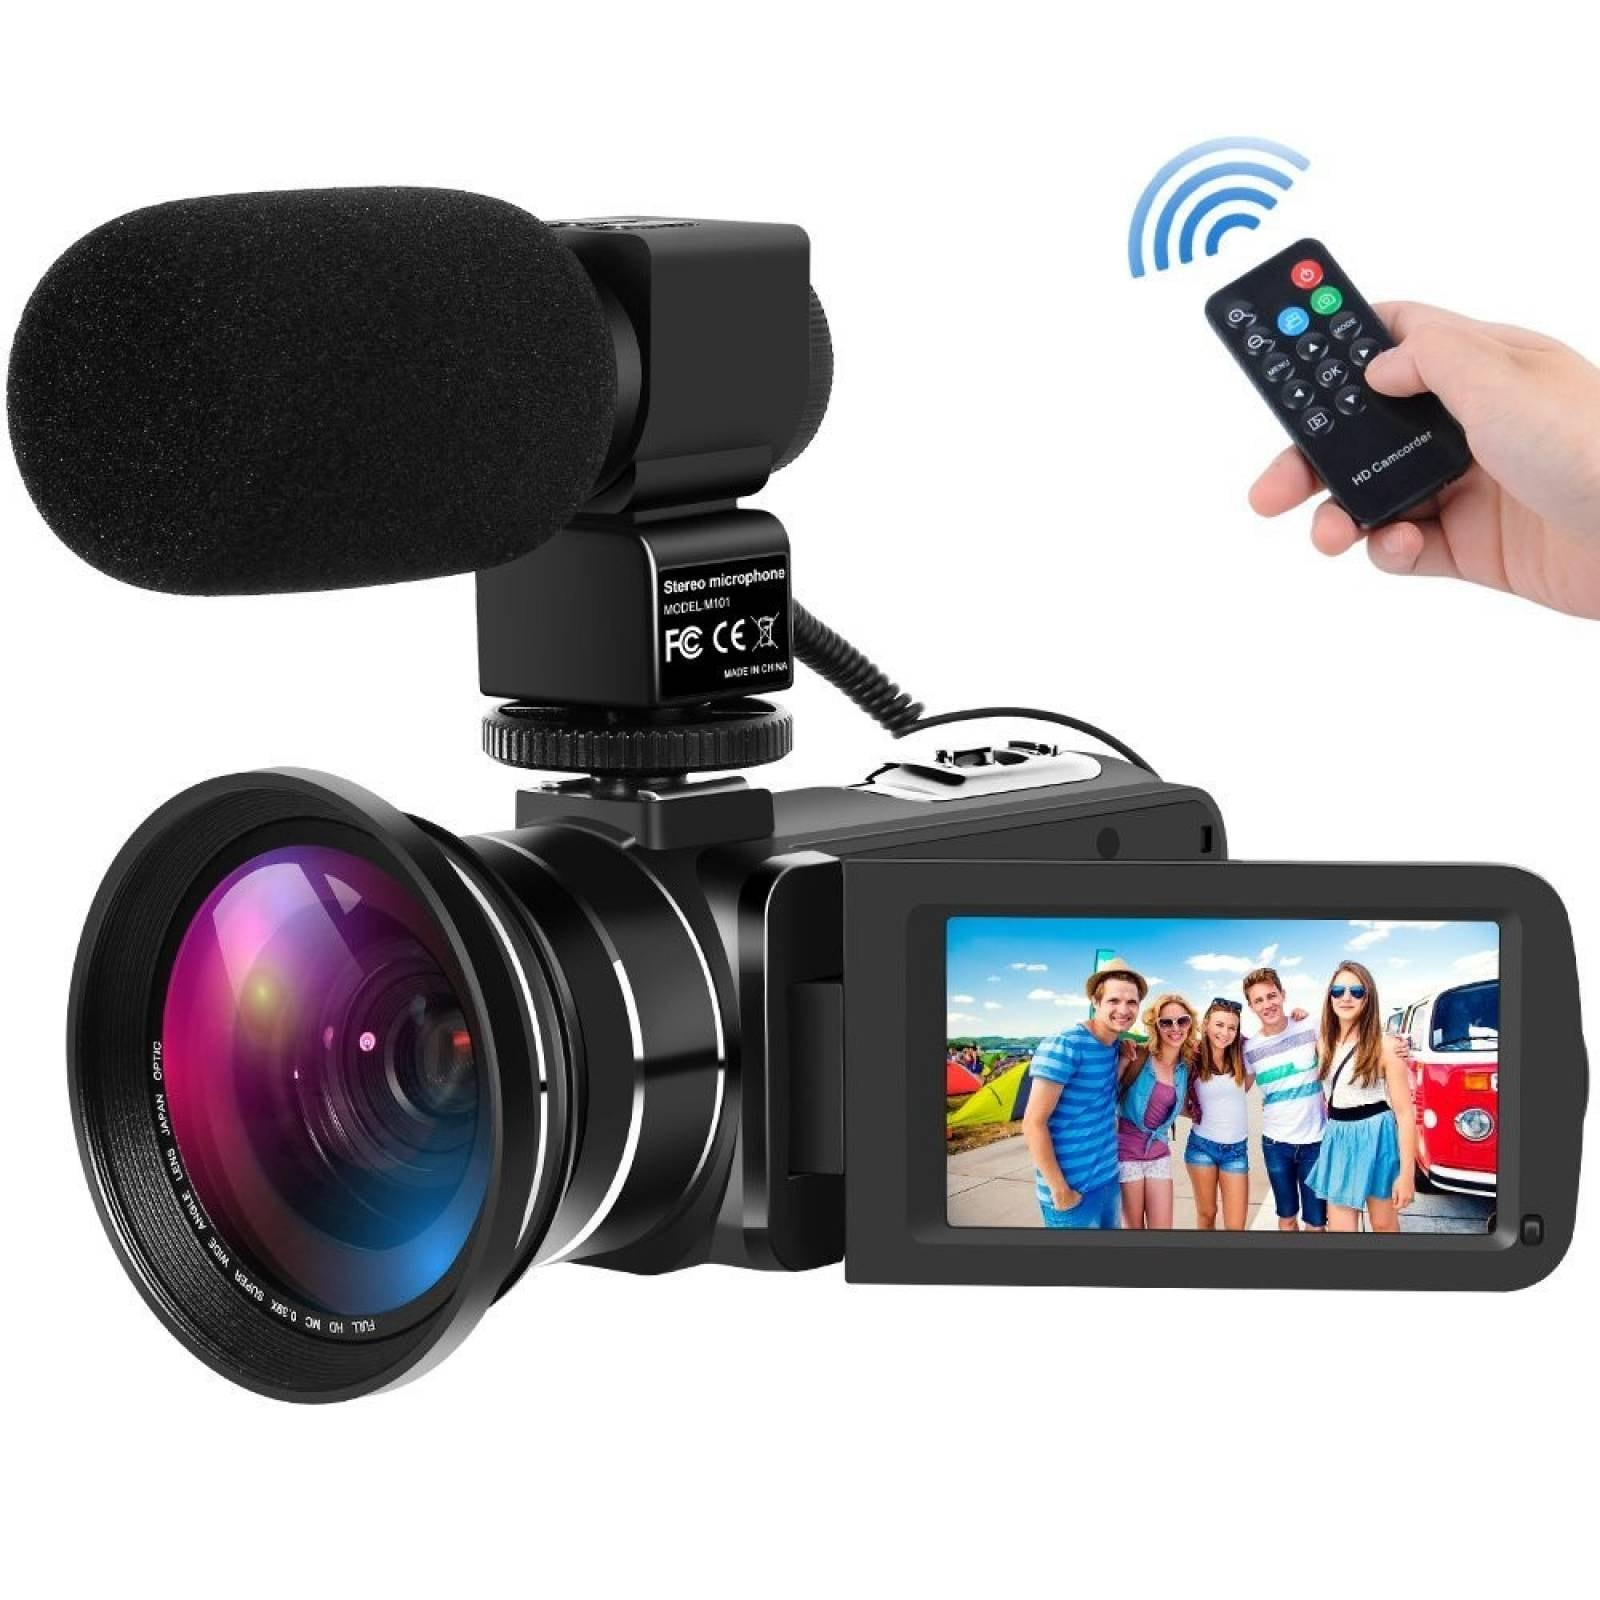 Videocámara Hd 30fps 24mp 16x D. Zoom V.nocturna C Microfono